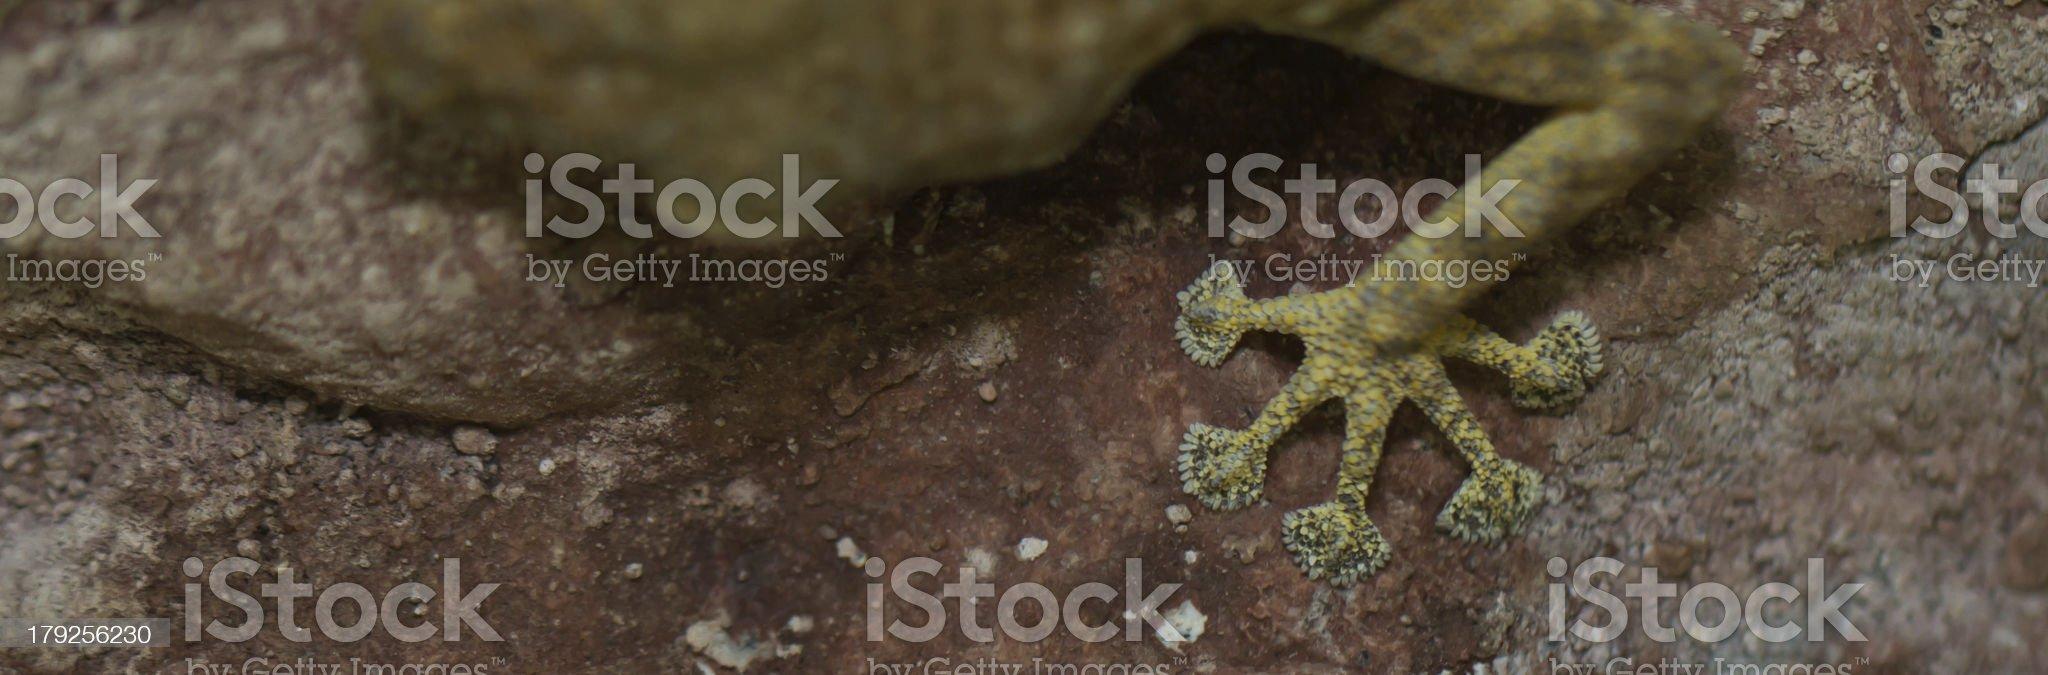 foot of fan toed gecko royalty-free stock photo